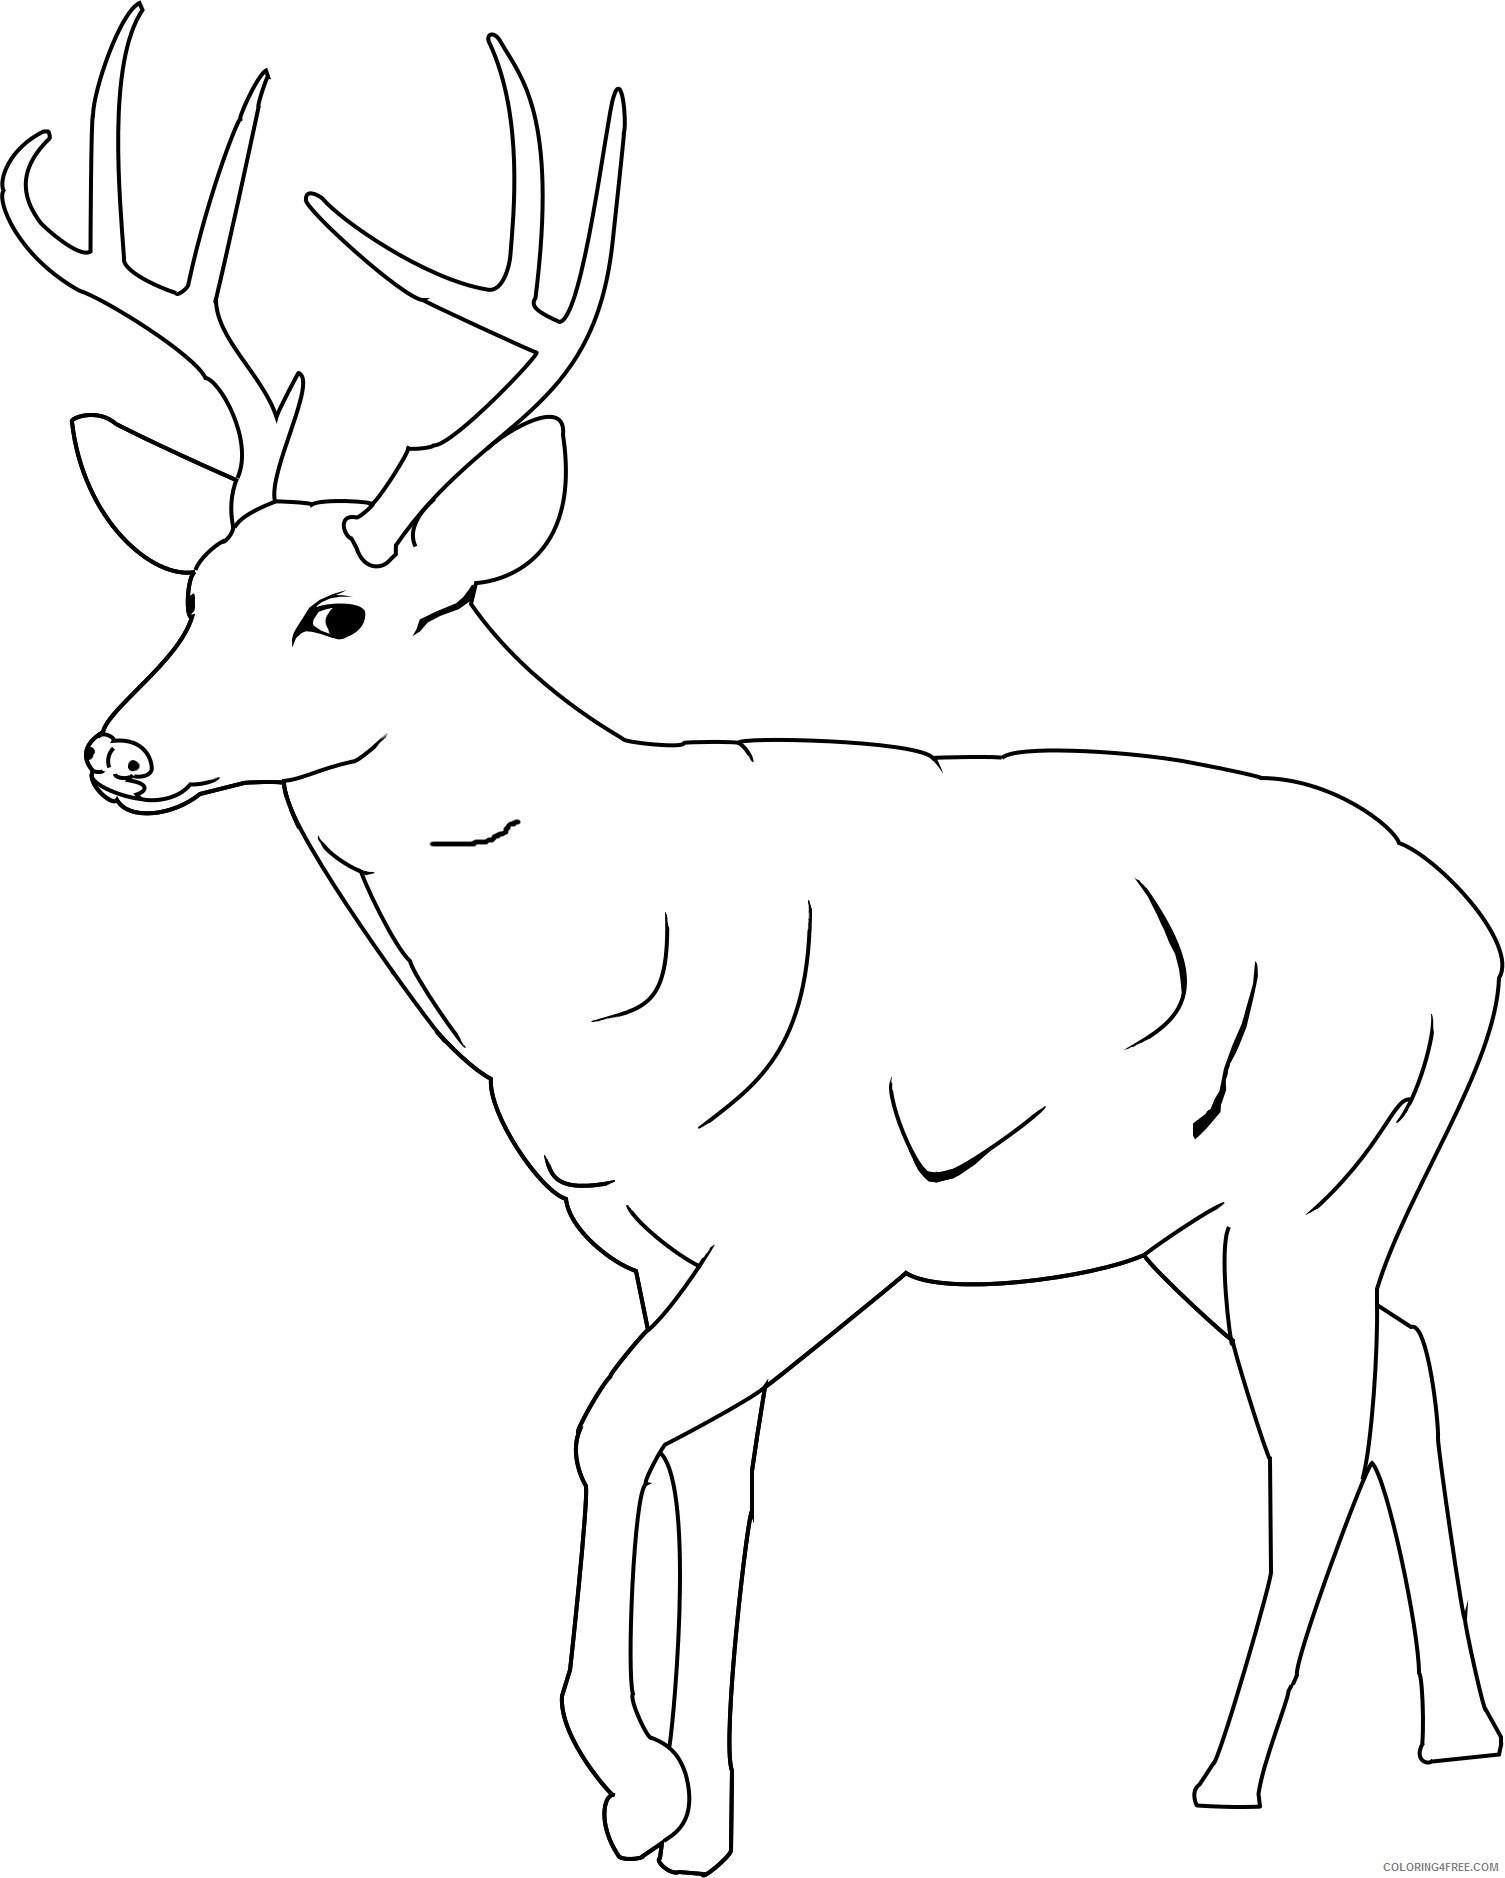 printable deer coloring pages Coloring4free